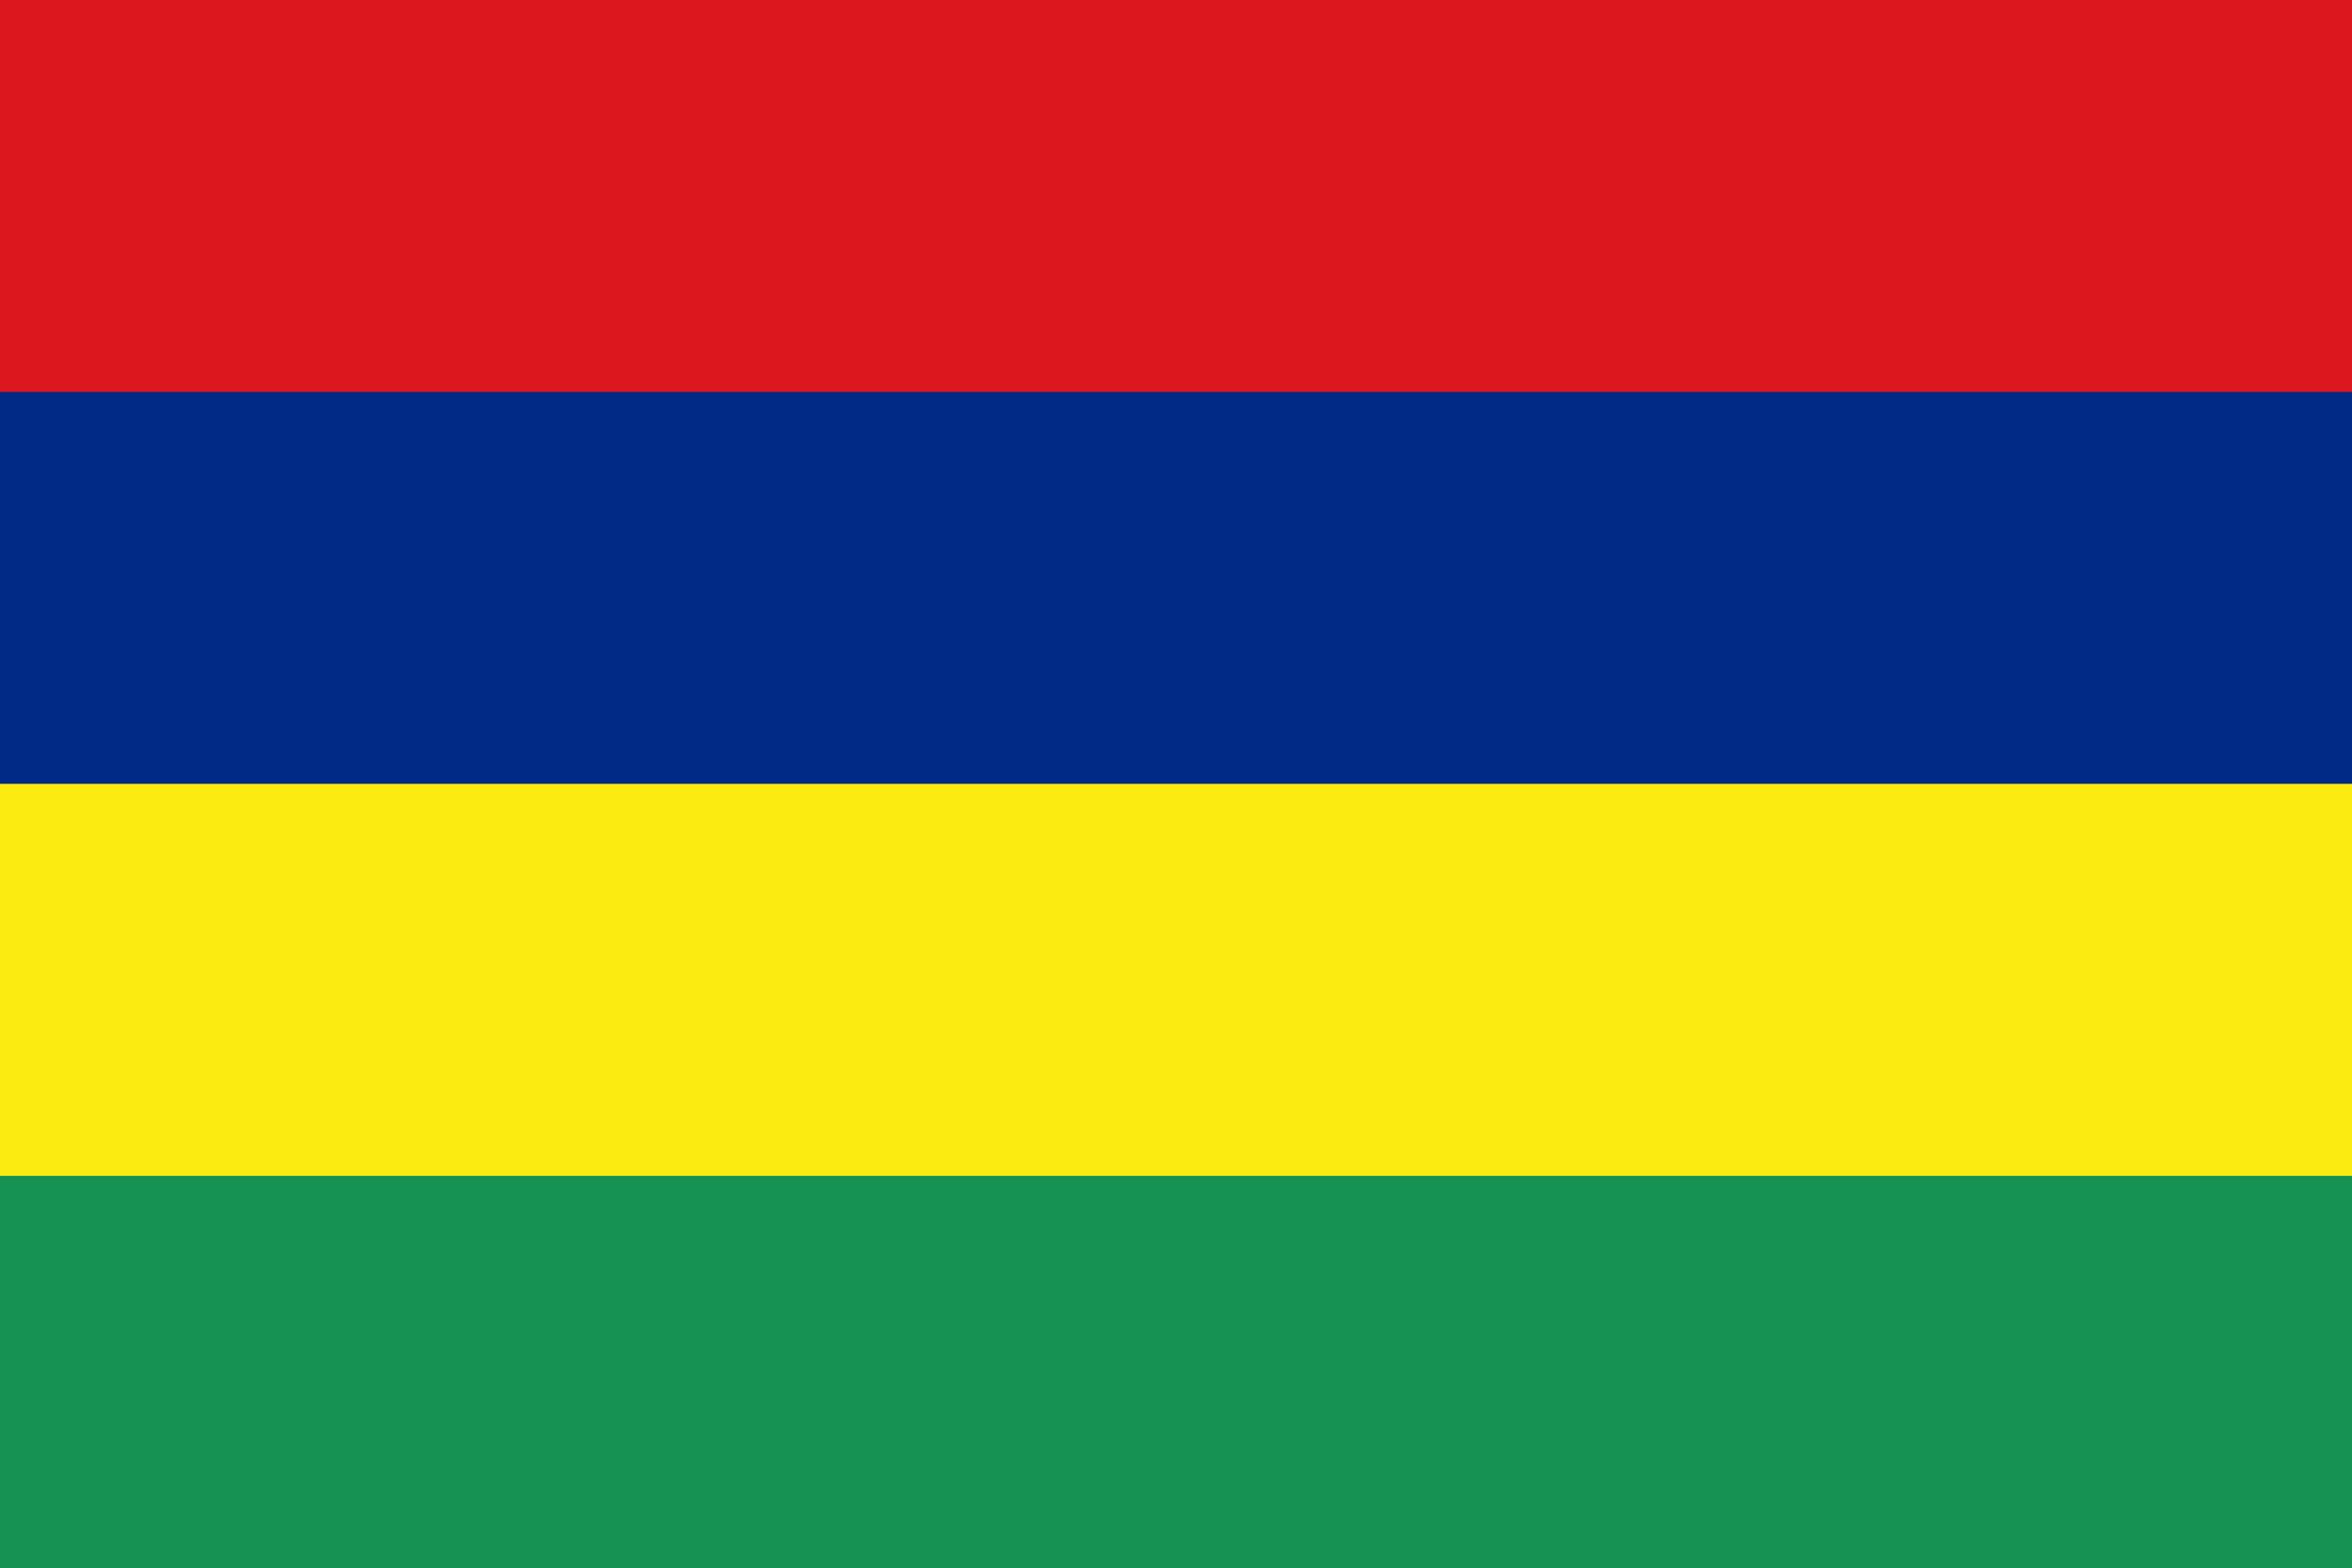 Mauricio, pays, emblème, logo, symbole - Fonds d'écran HD - Professor-falken.com